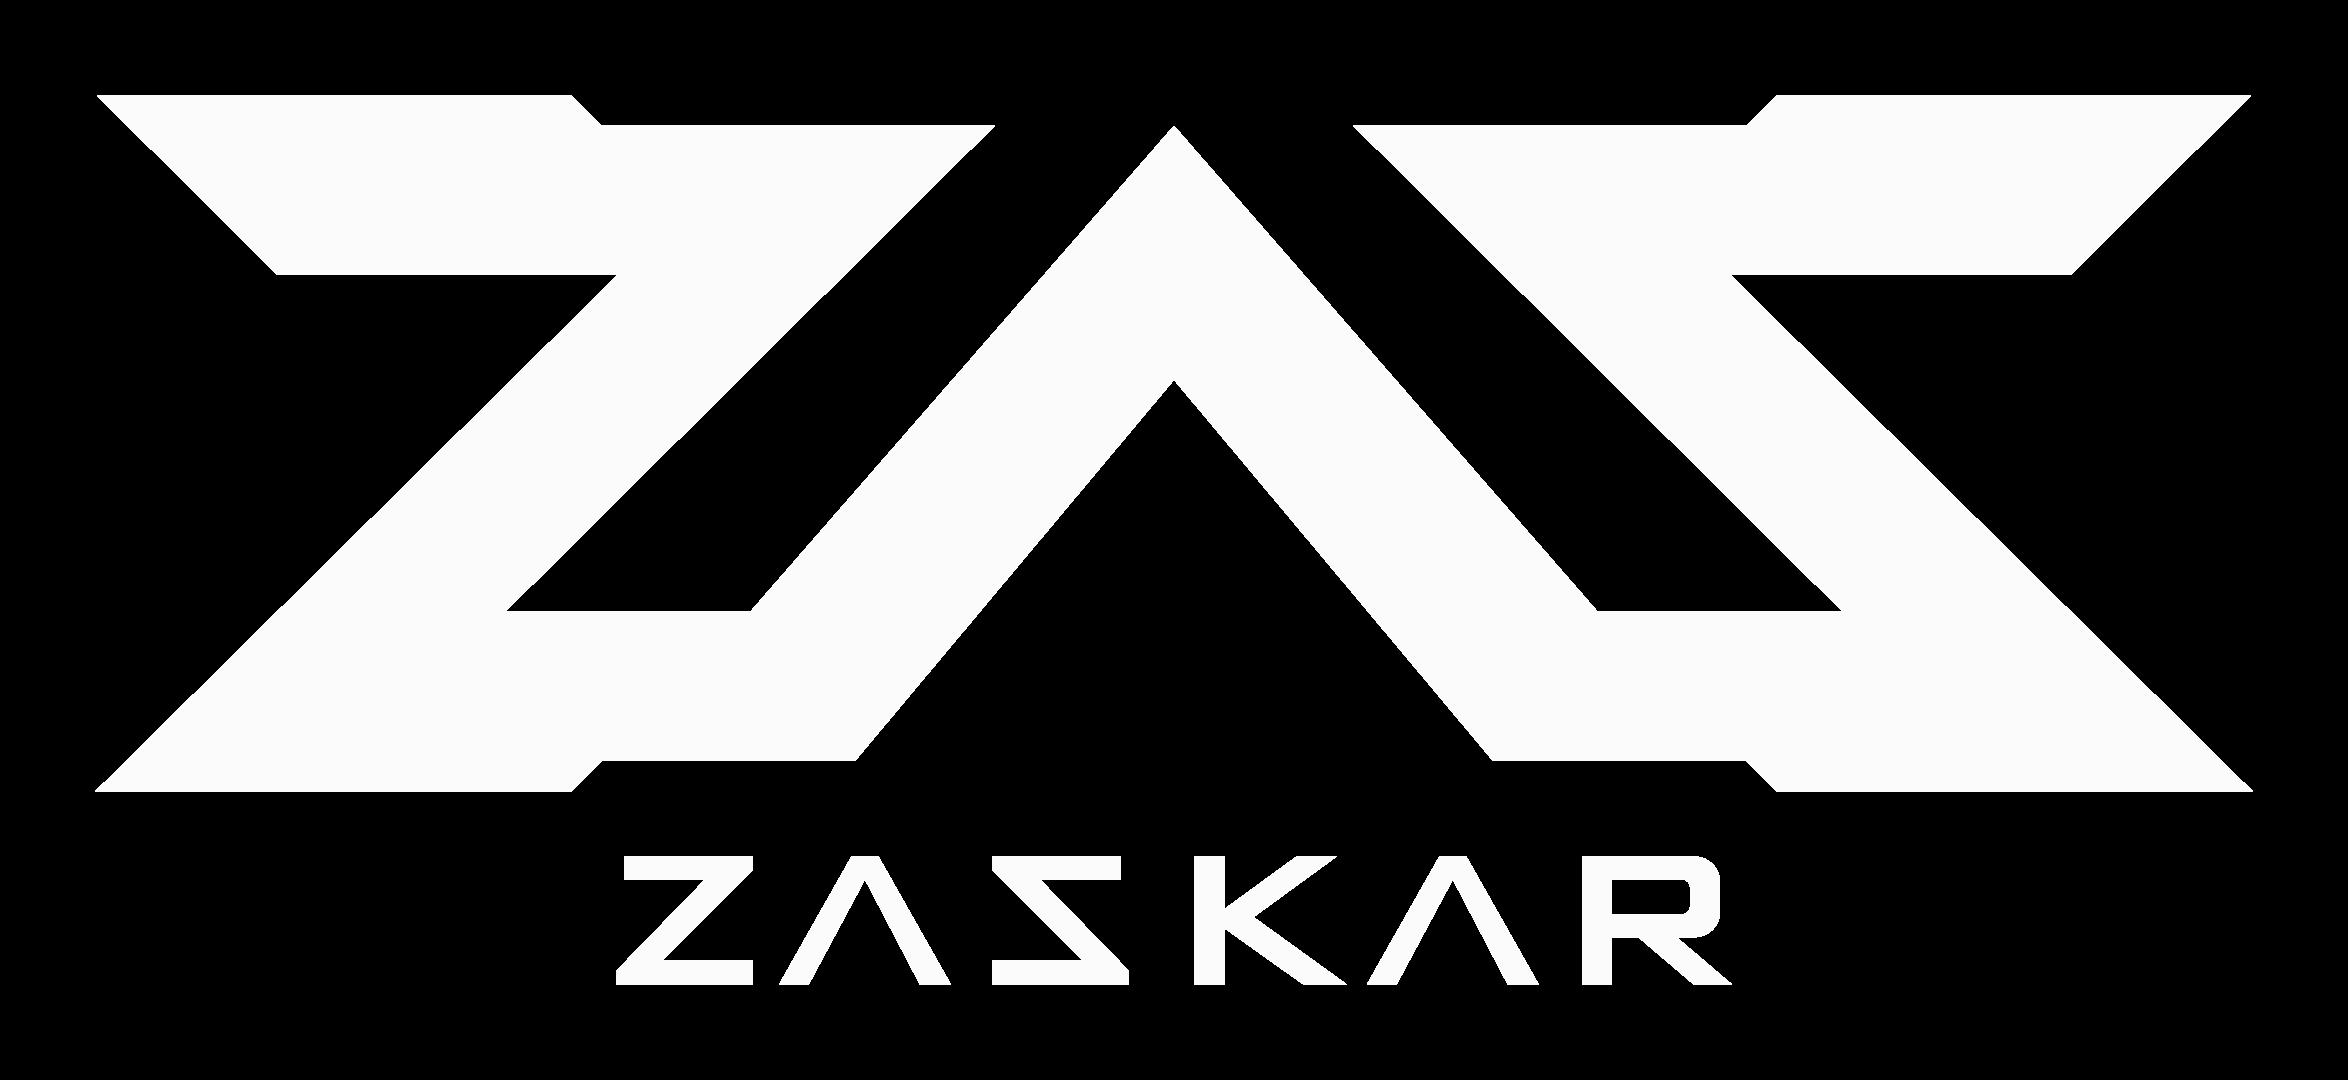 Gun gale online zaskar logo by darkblackswords on deviantart gun gale online zaskar logo by darkblackswords biocorpaavc